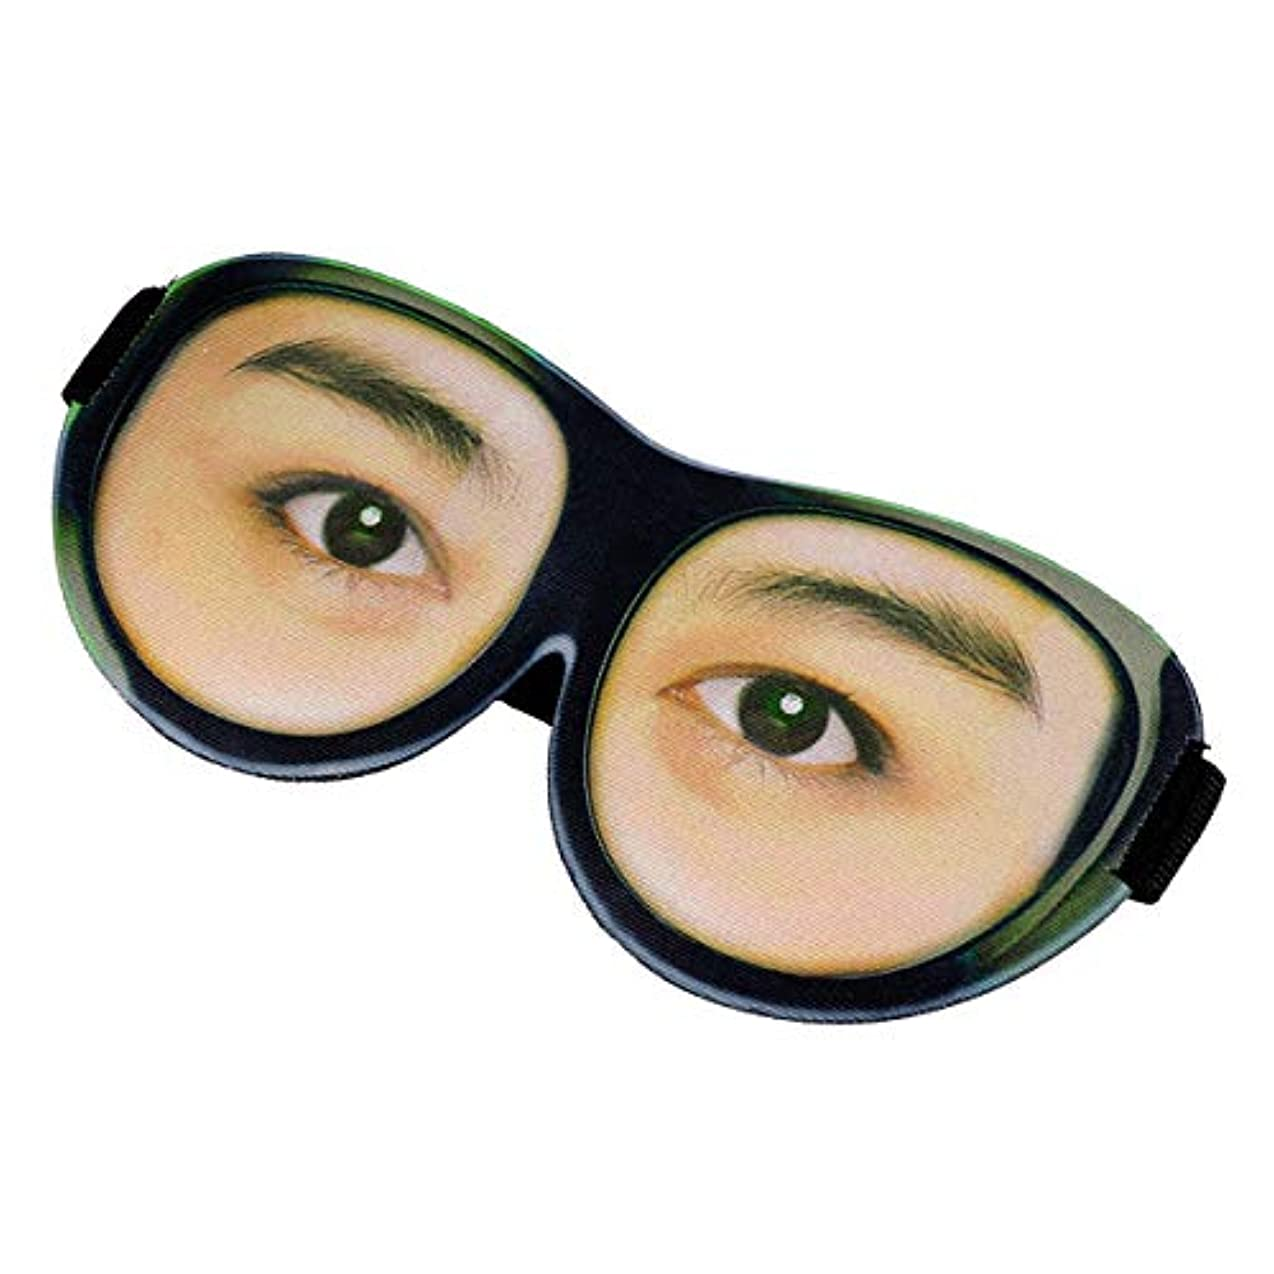 Beaupretty 睡眠マスクメガネ面白い3D調節可能ストラップ付きアイマスクアイシェード睡眠用アイシェード